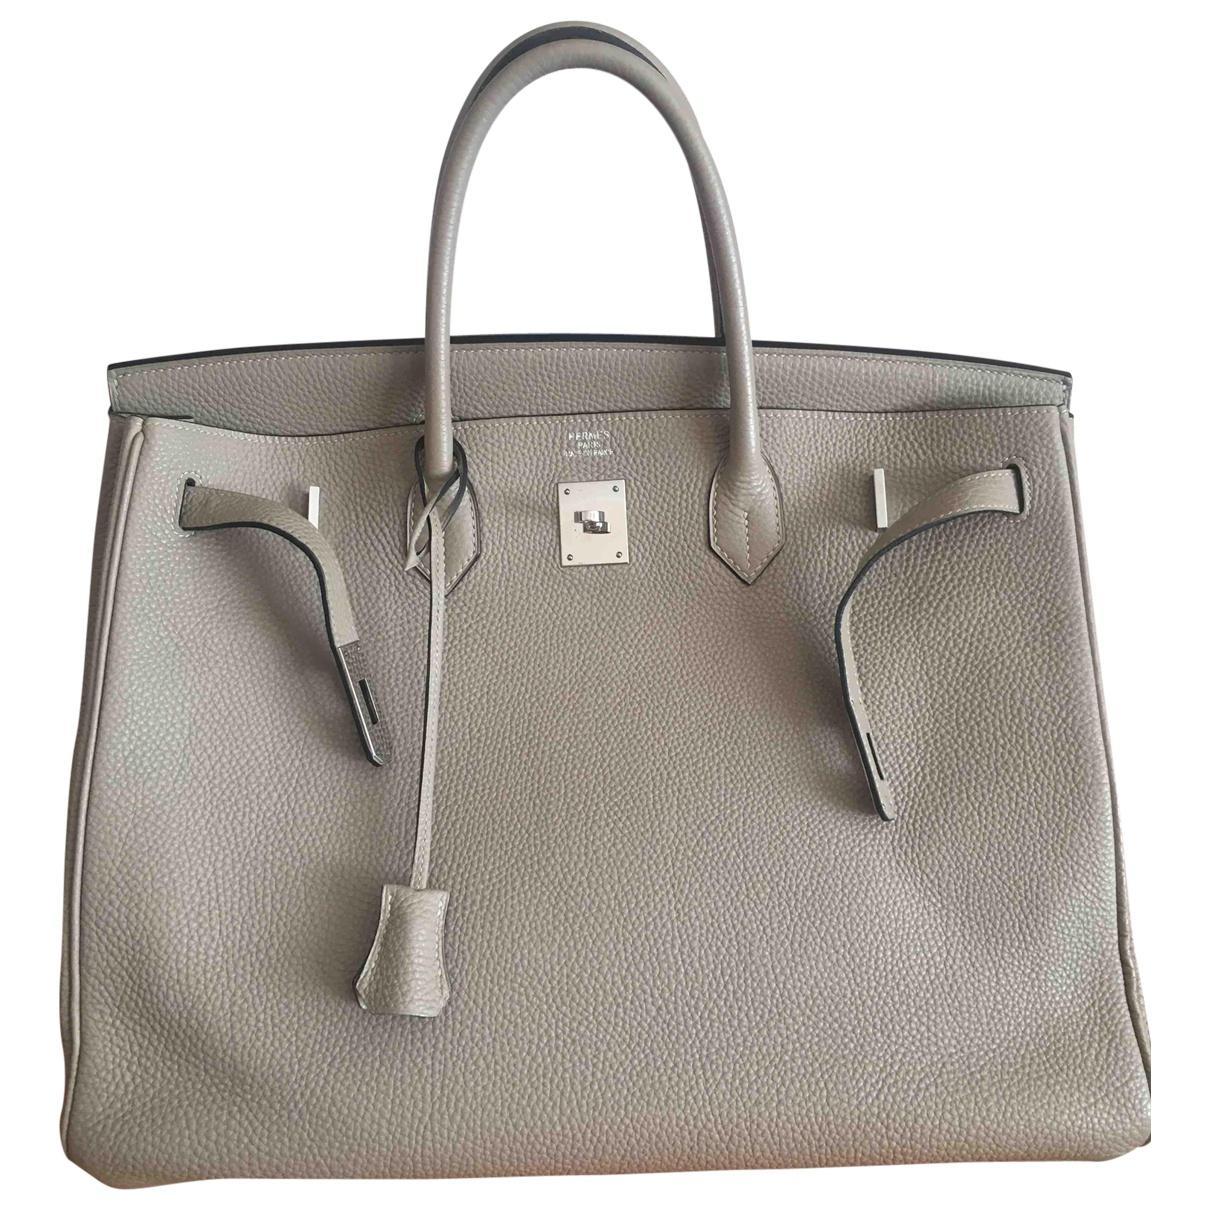 c1fb7ca0c7 Lyst - Hermès Birkin 40 Leather Handbag in Natural